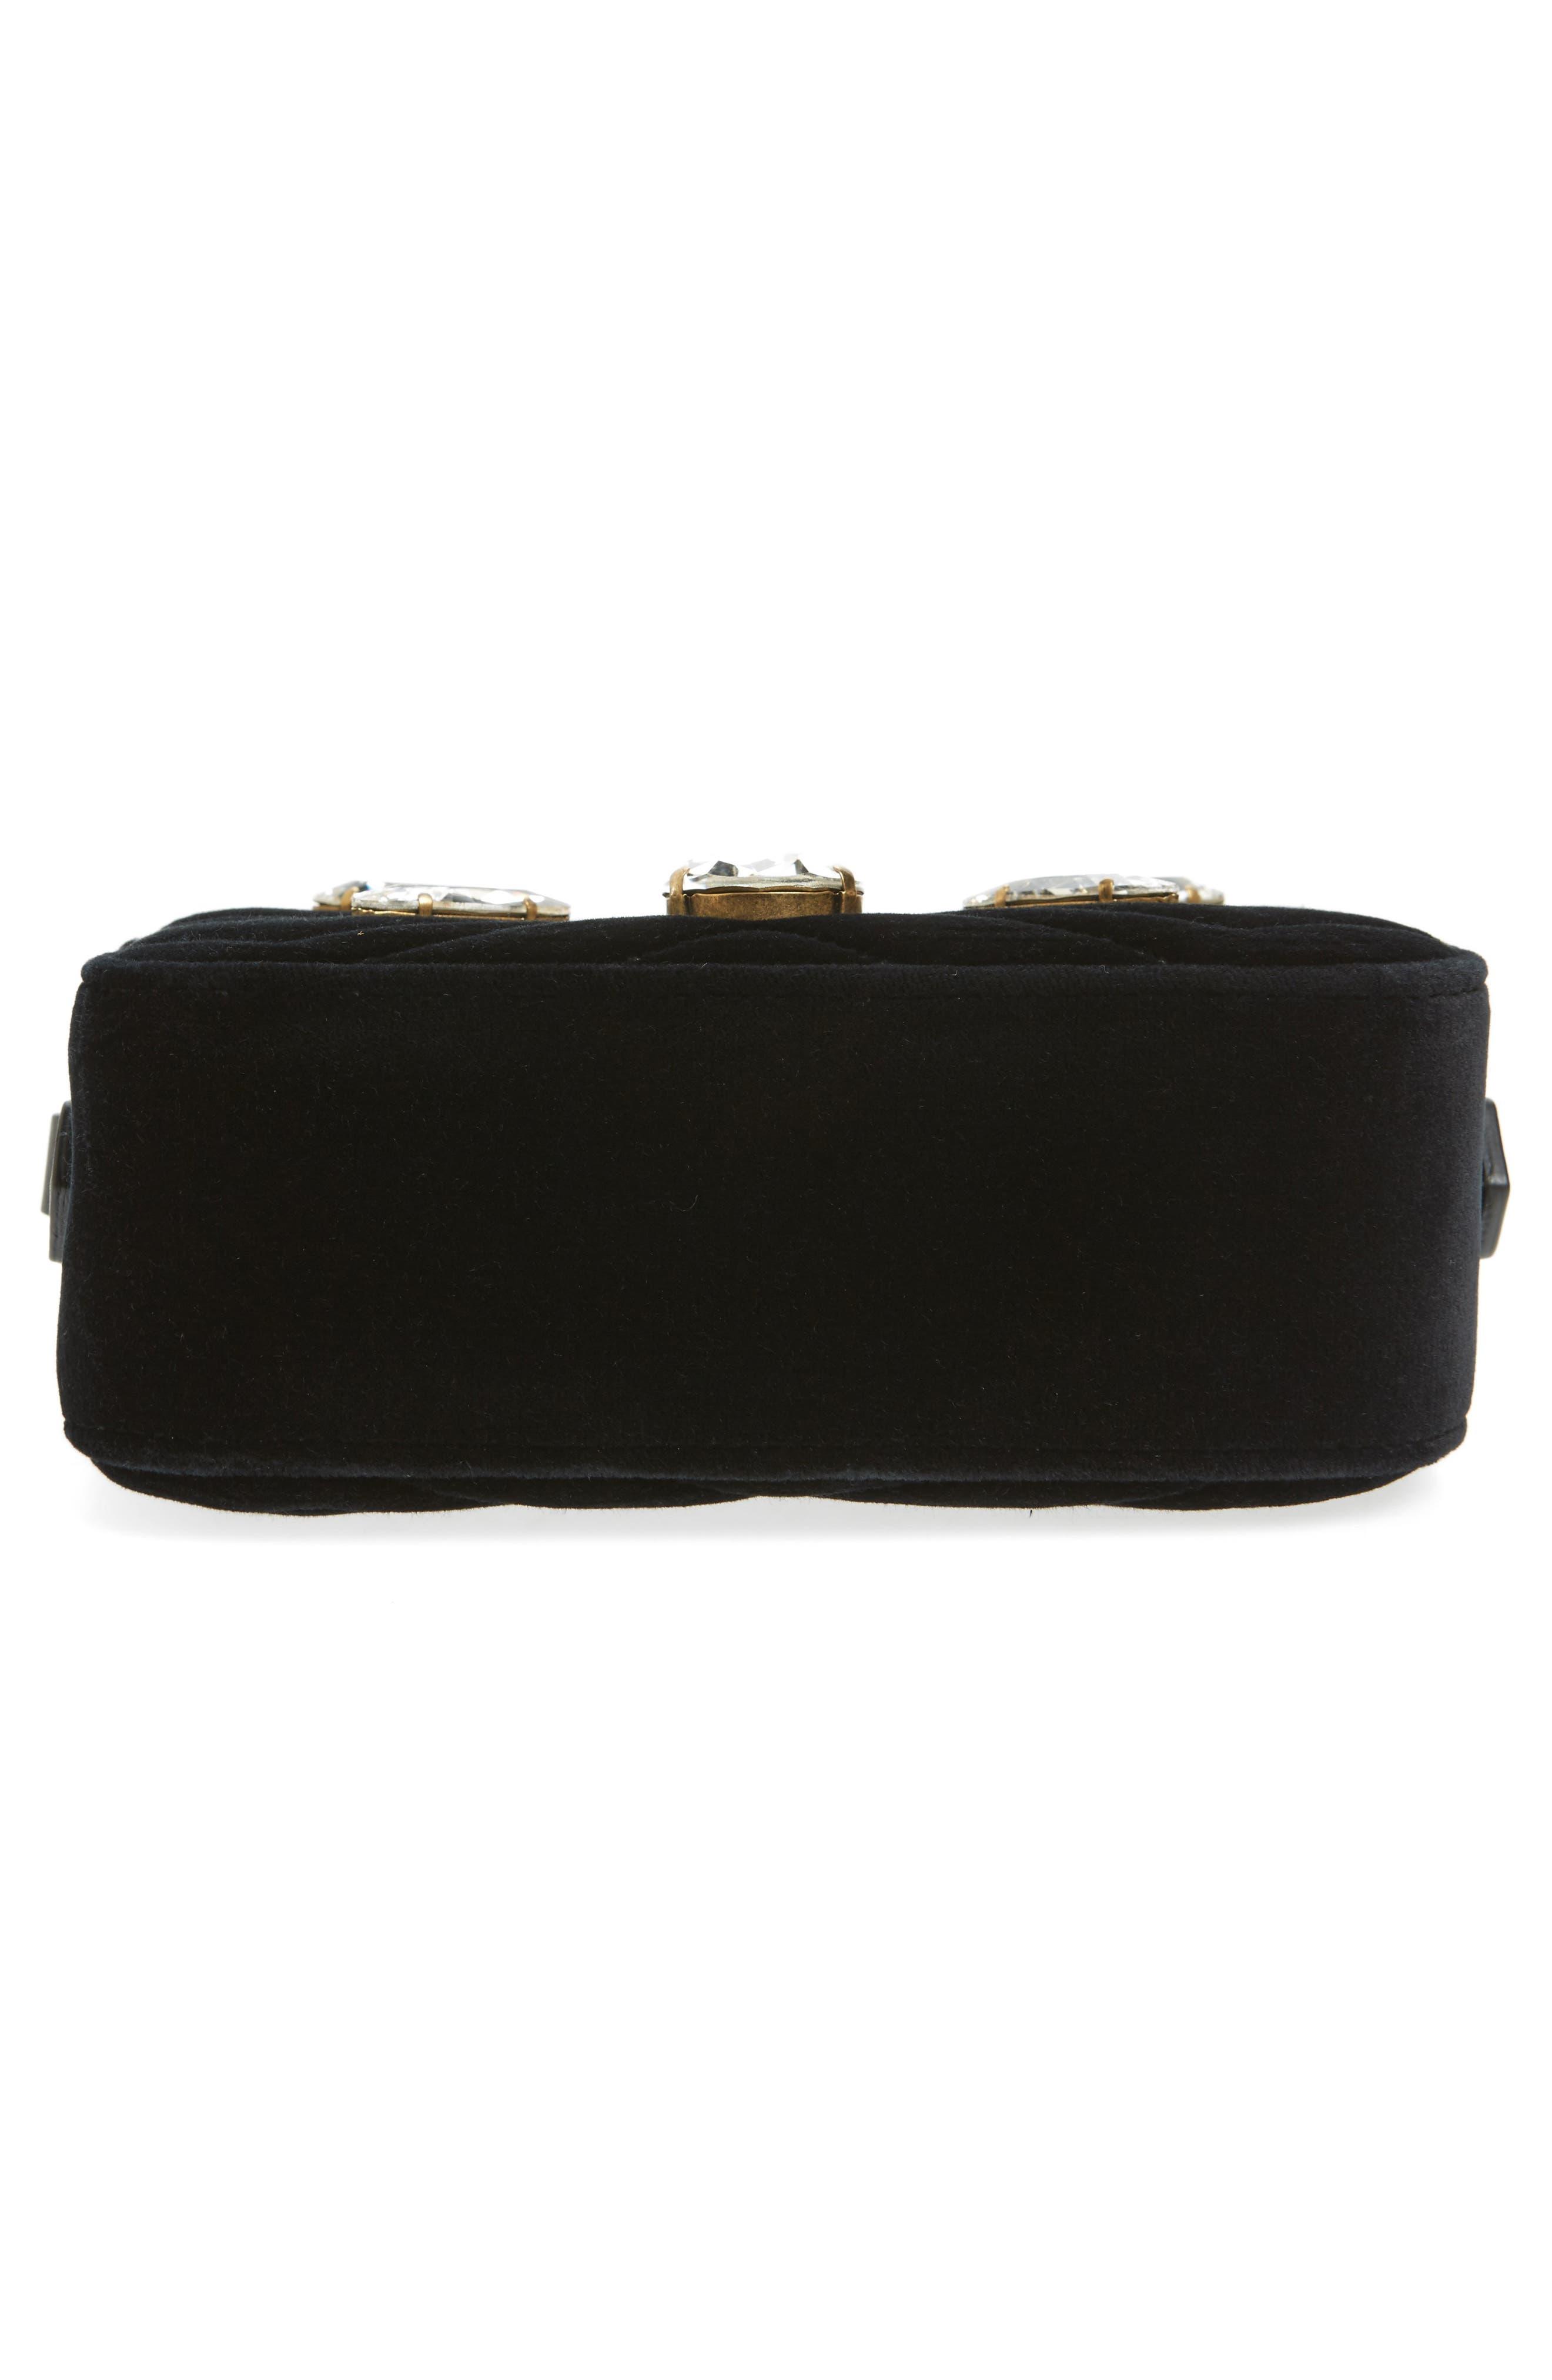 GG Marmont Crystal Matelassé Quilted Velvet Crossbody Bag,                             Alternate thumbnail 6, color,                             001